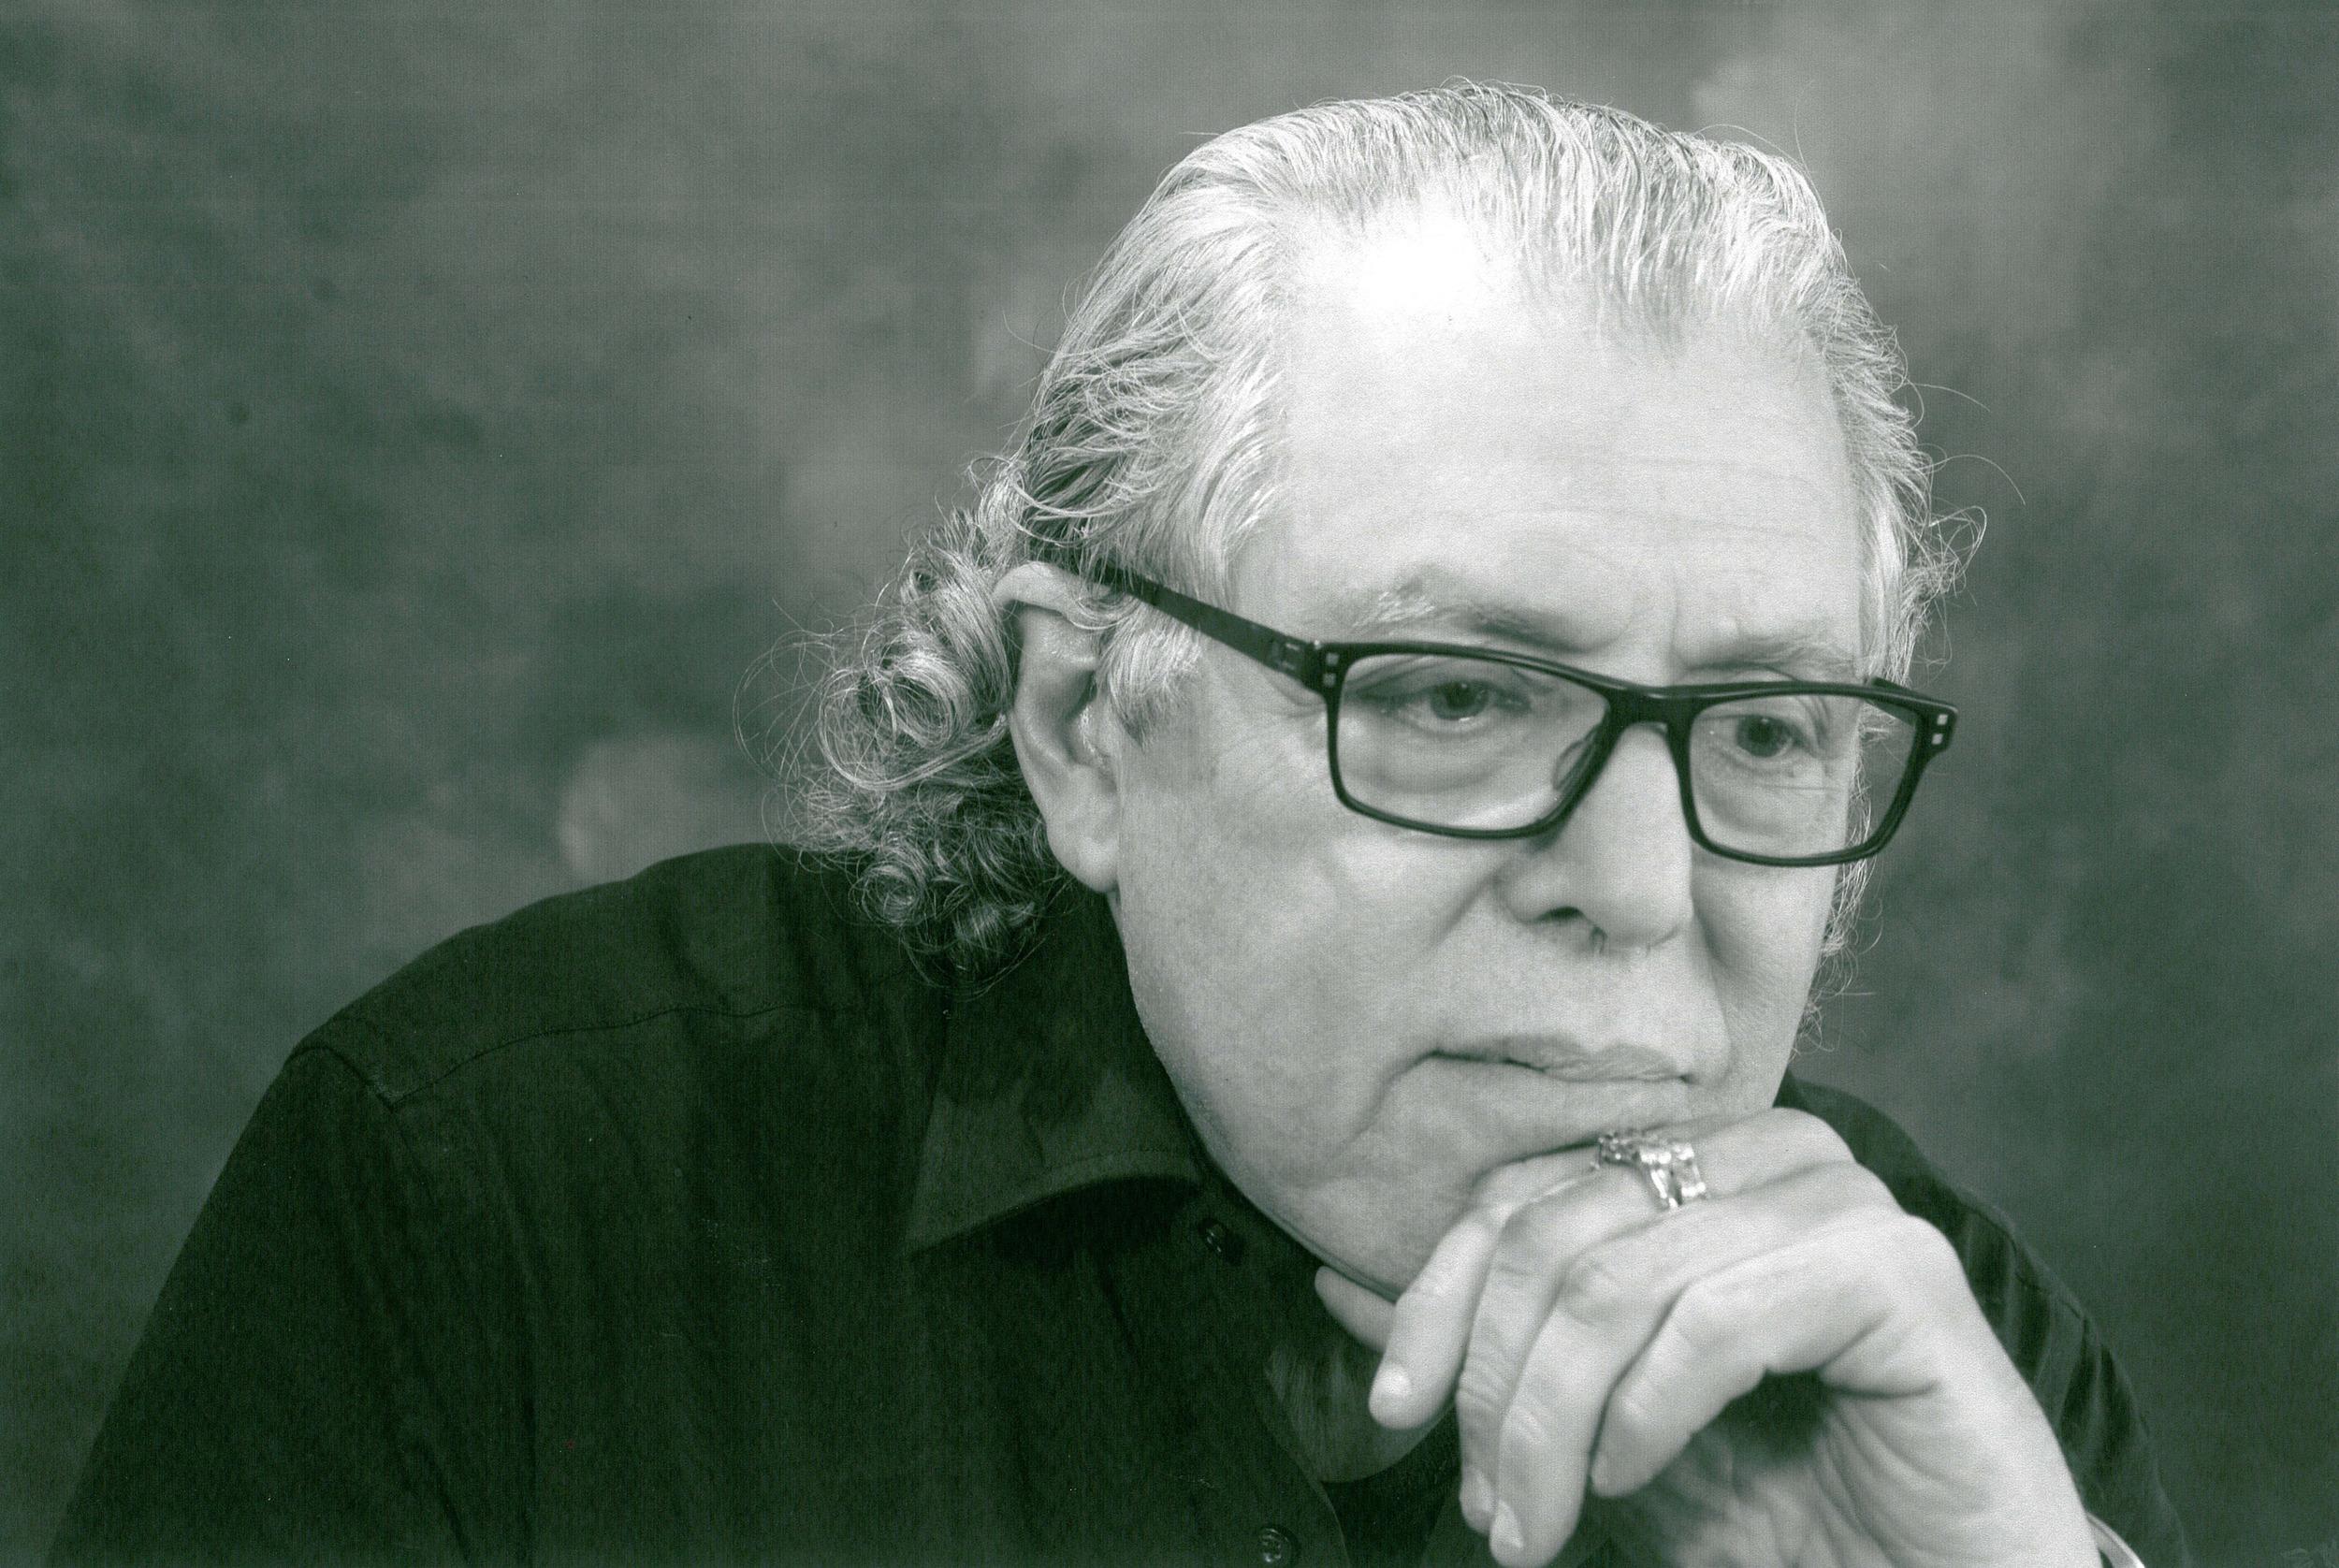 Michael L. Oxman, Principal Architect